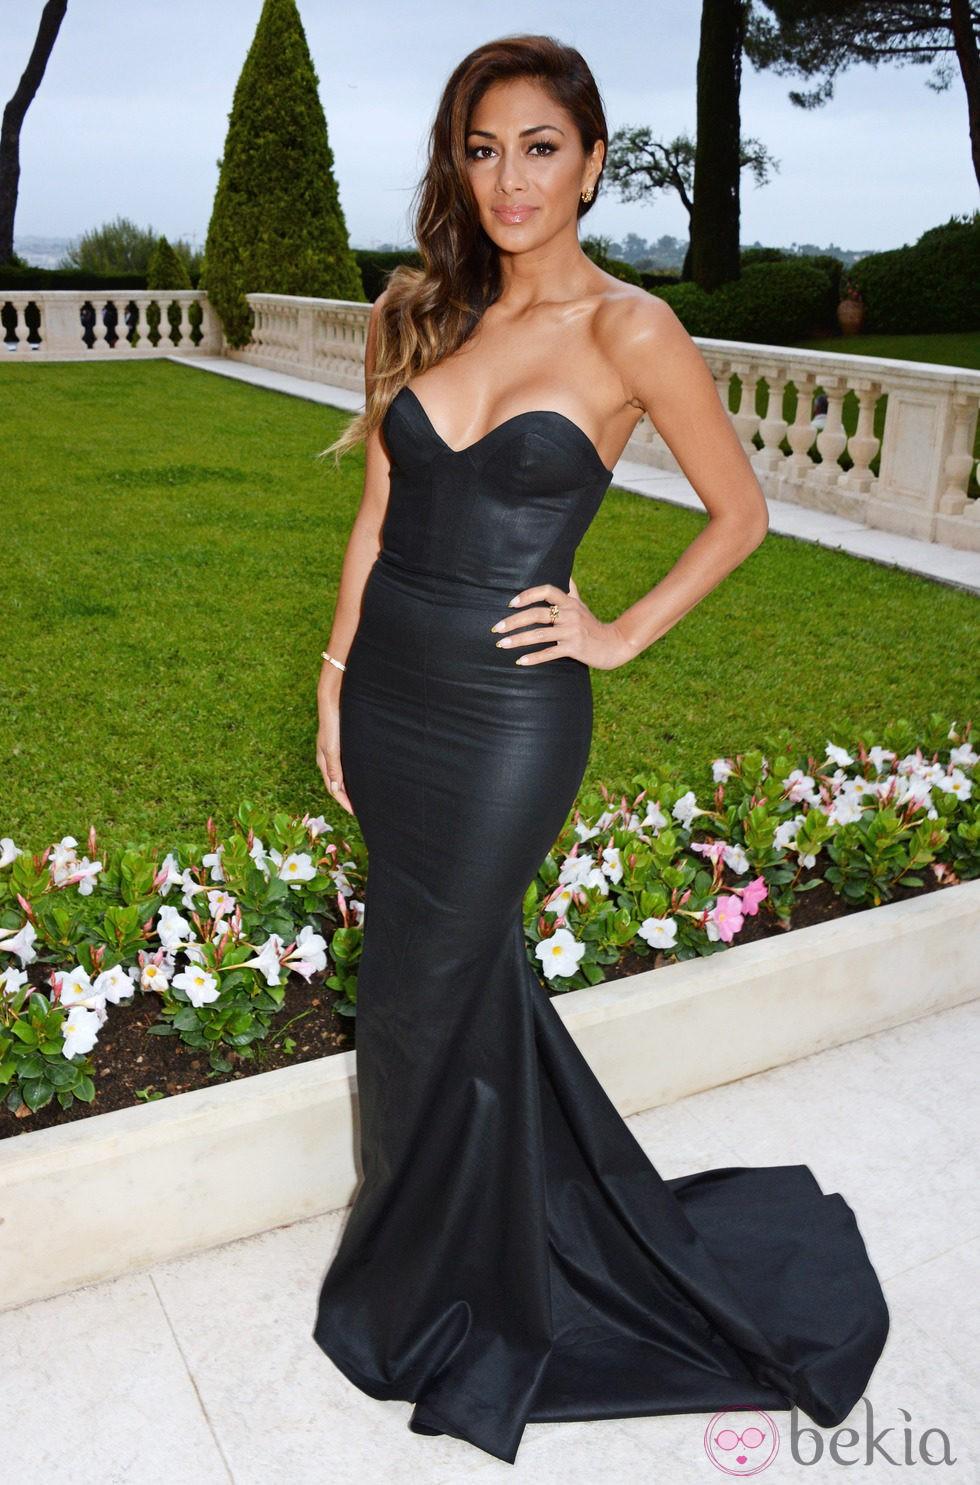 Nicole Scherzinger en la gala amfAR del Festival de Cannes 2014